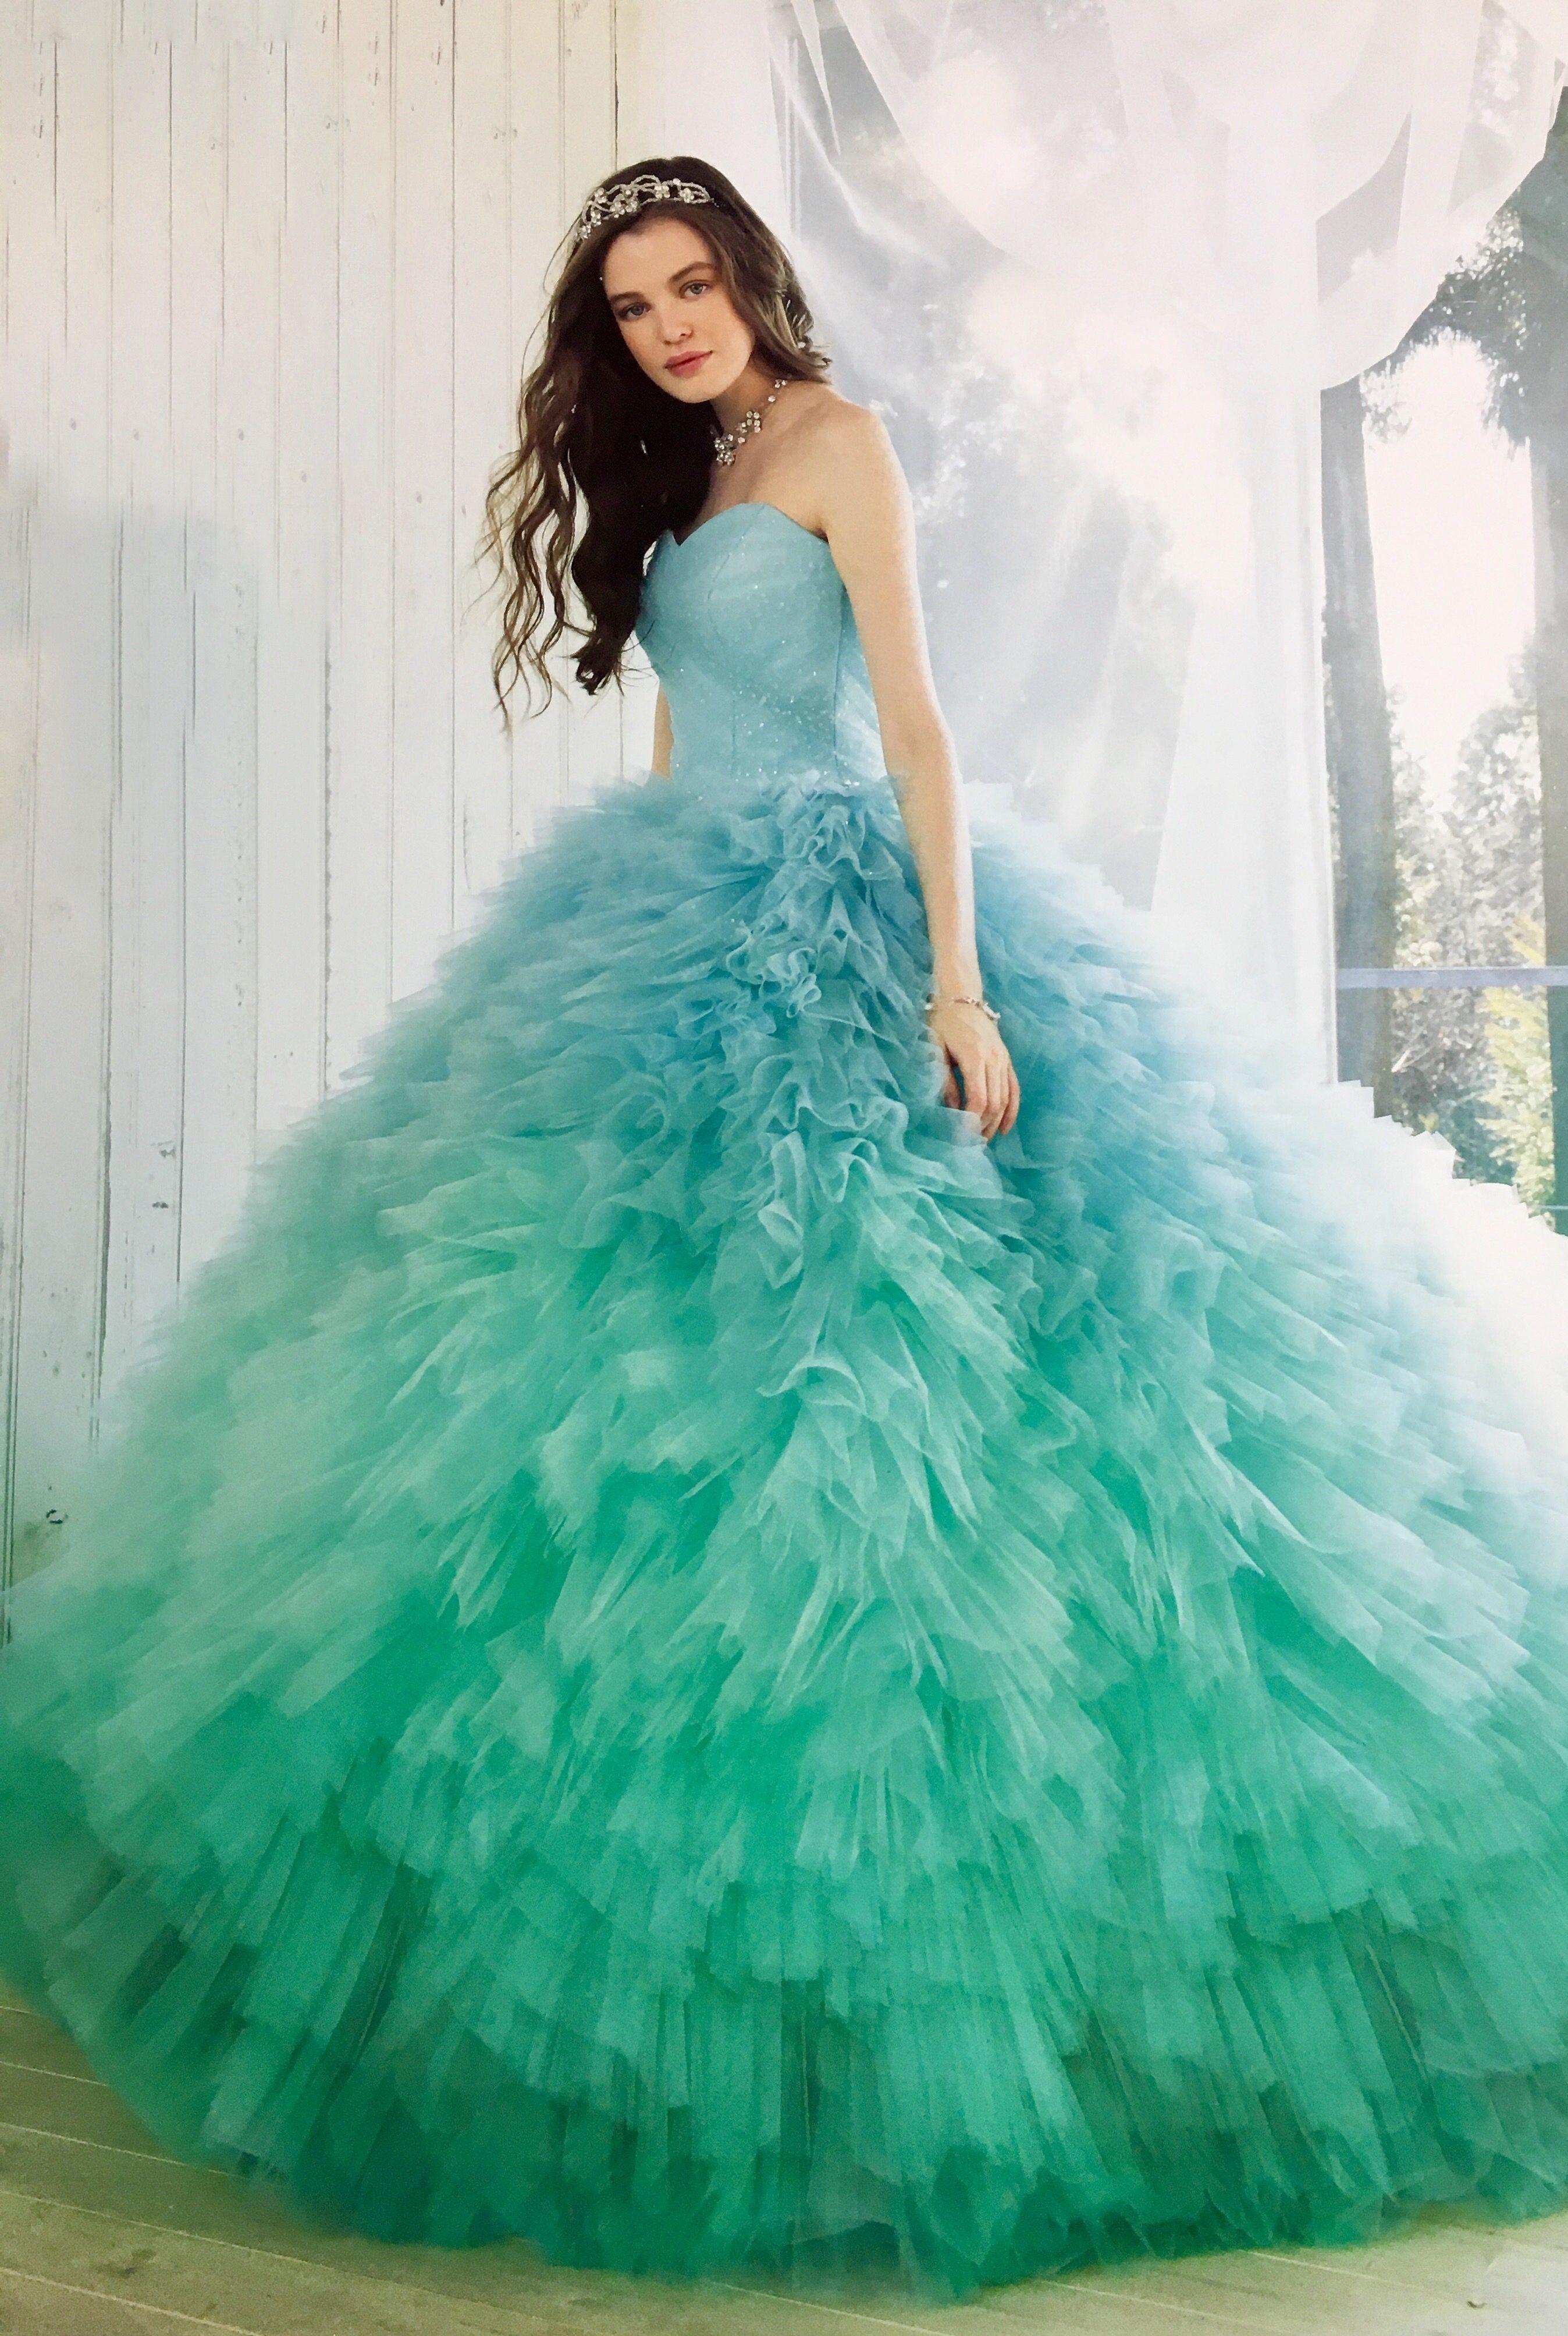 40 Blue Wedding Dresses: Your BFF Will Wish She Hadn't Worn White